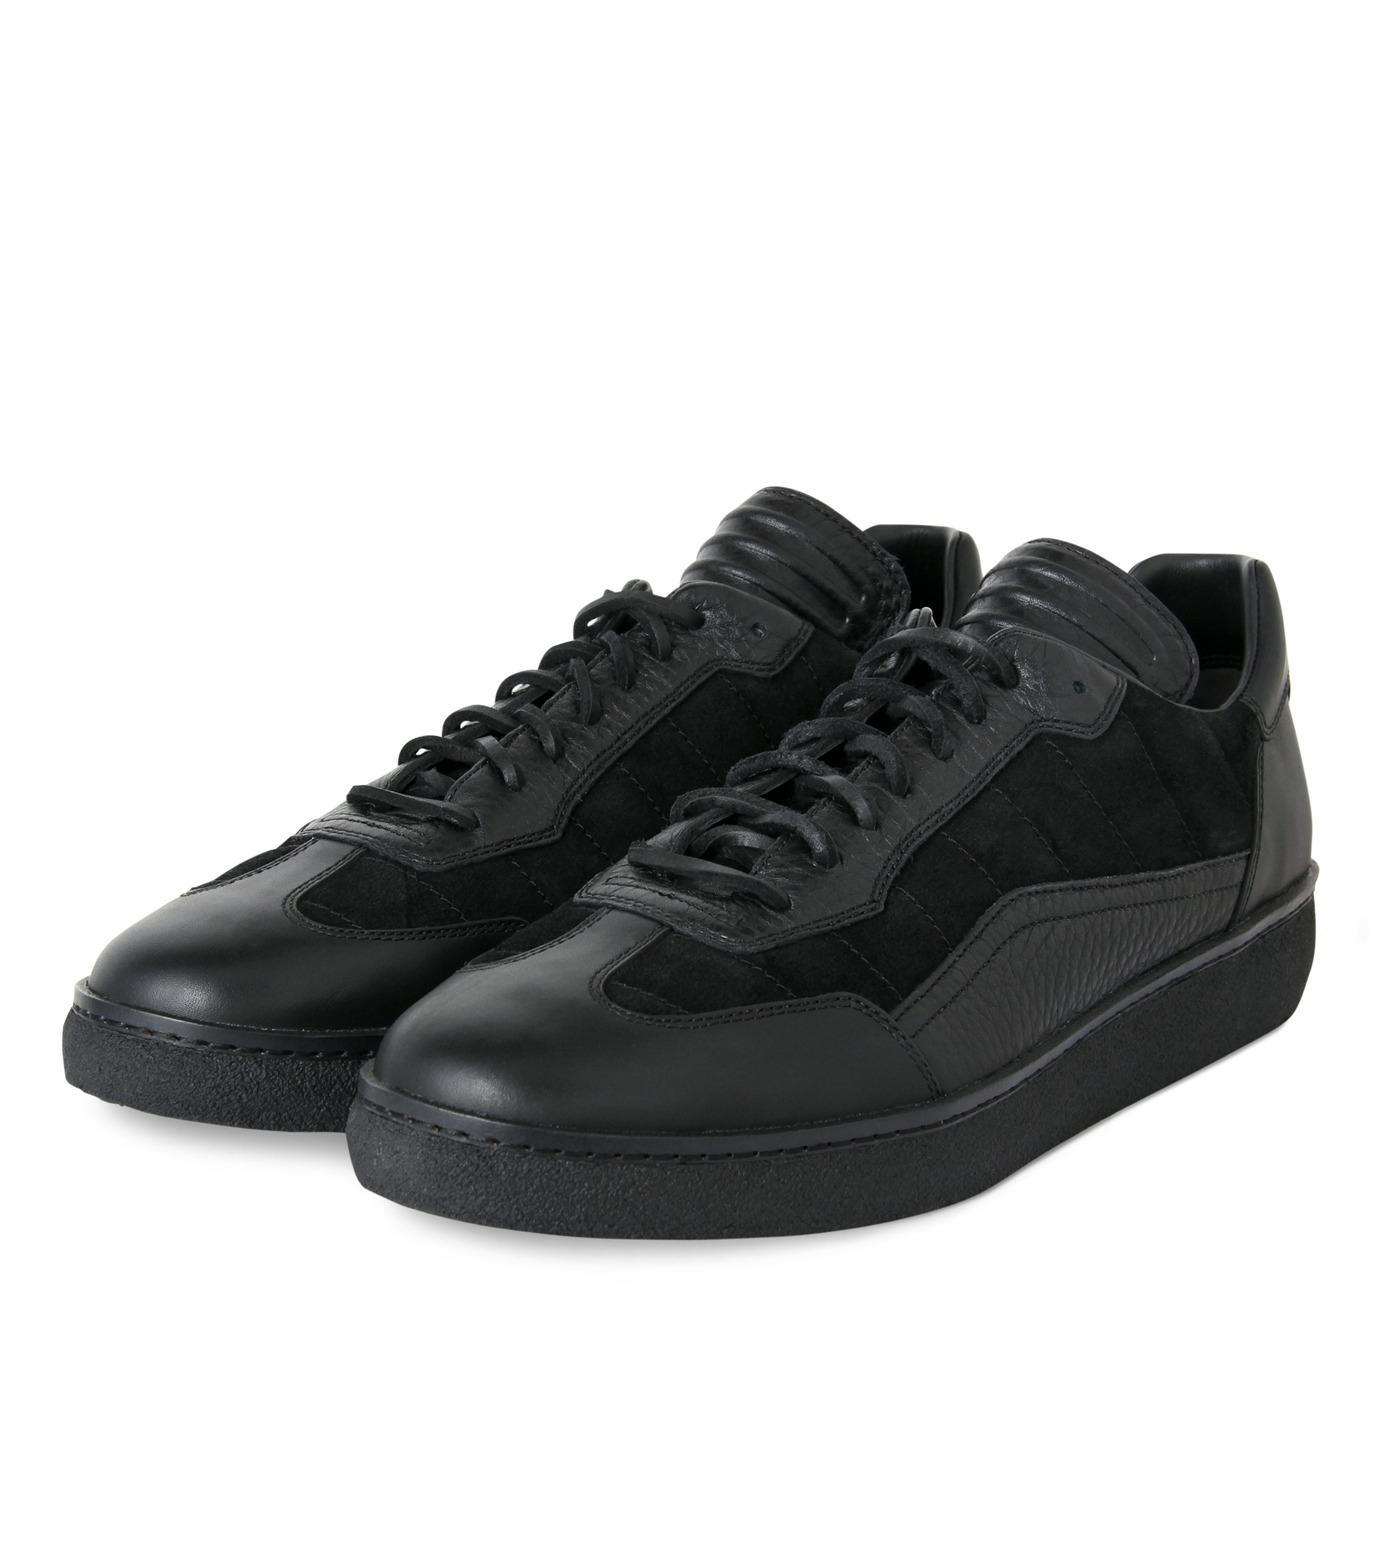 Alexander Wang(アレキサンダーワン)のEden Low-BLACK(シューズ/shoes)-311103S16-13 拡大詳細画像3